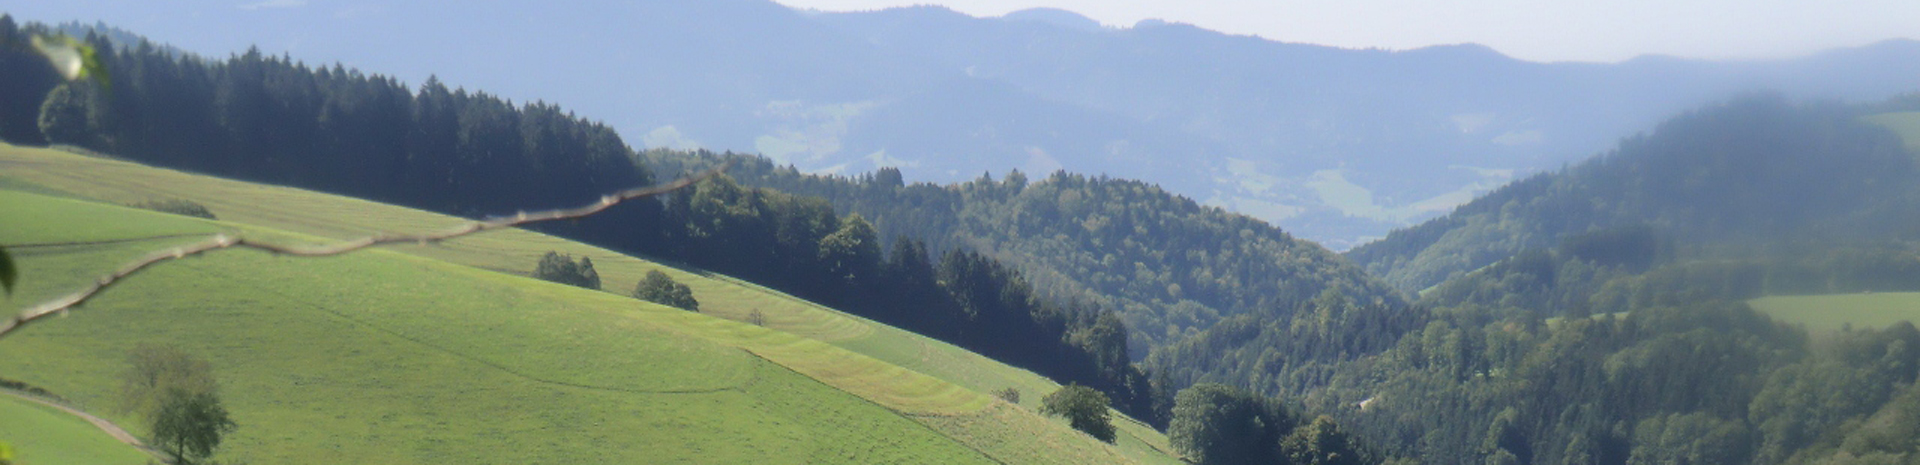 Urlaub in Bernau im Schwarzwald